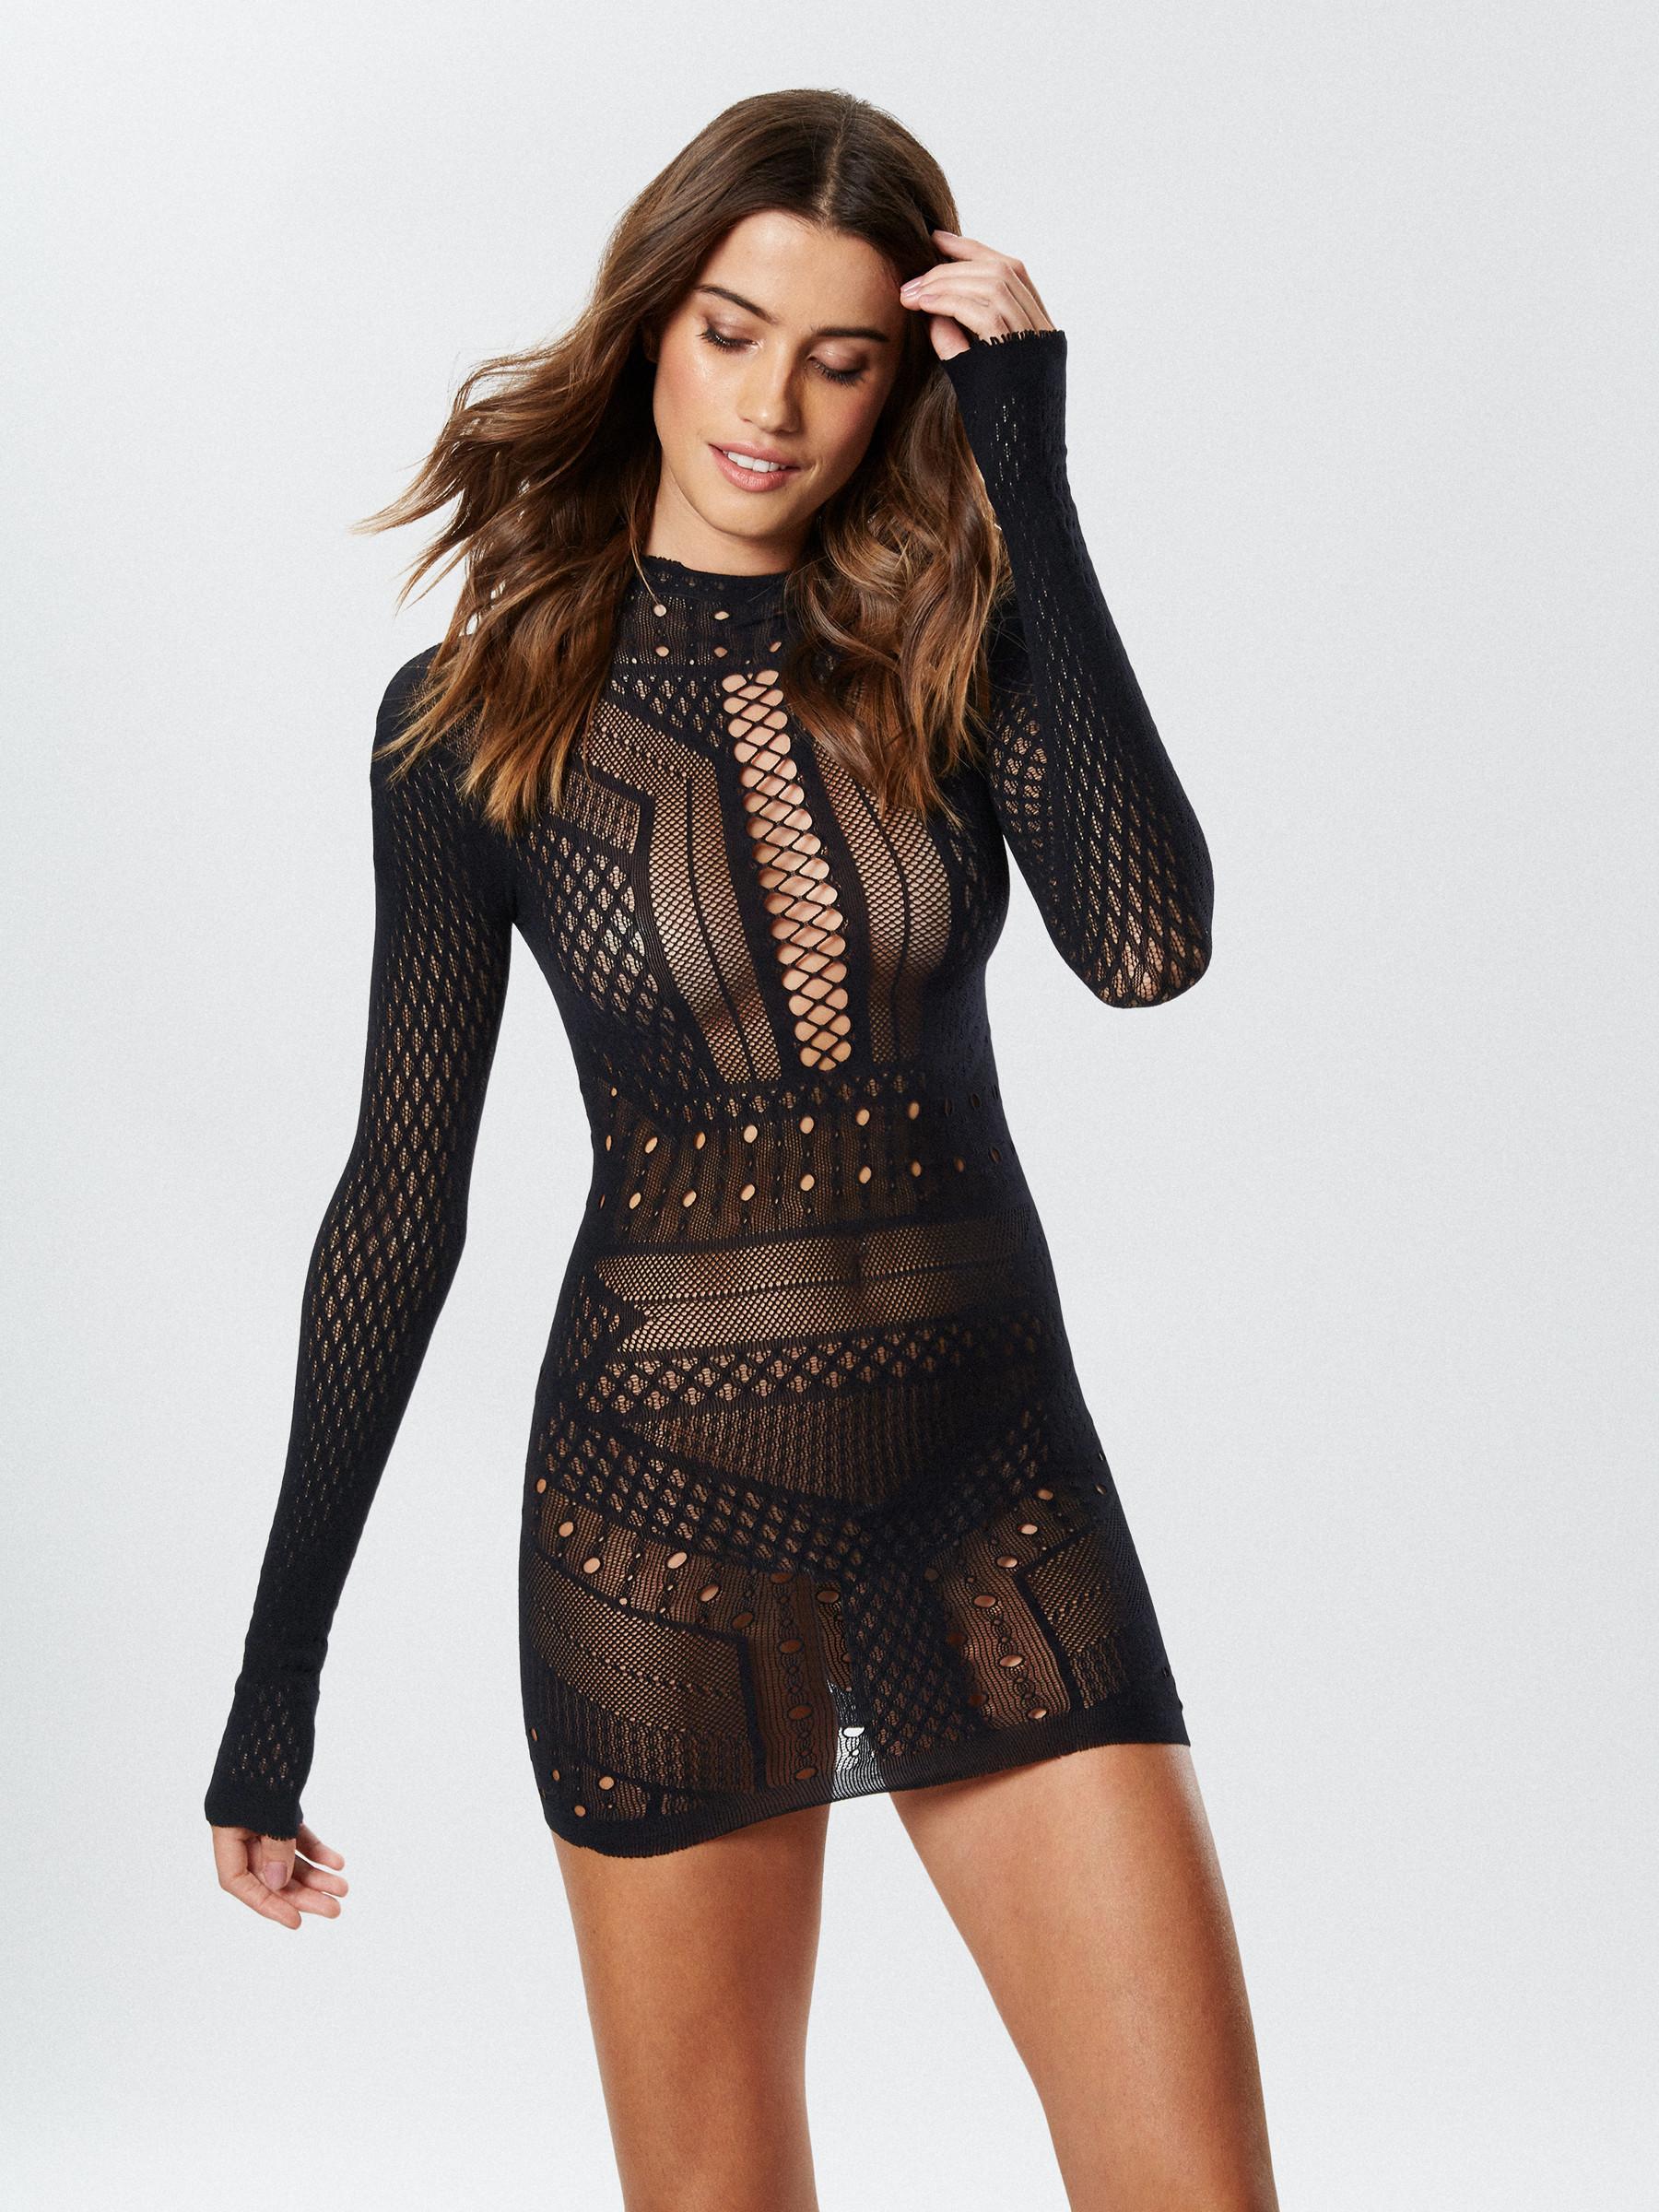 Sexy mesh clothing